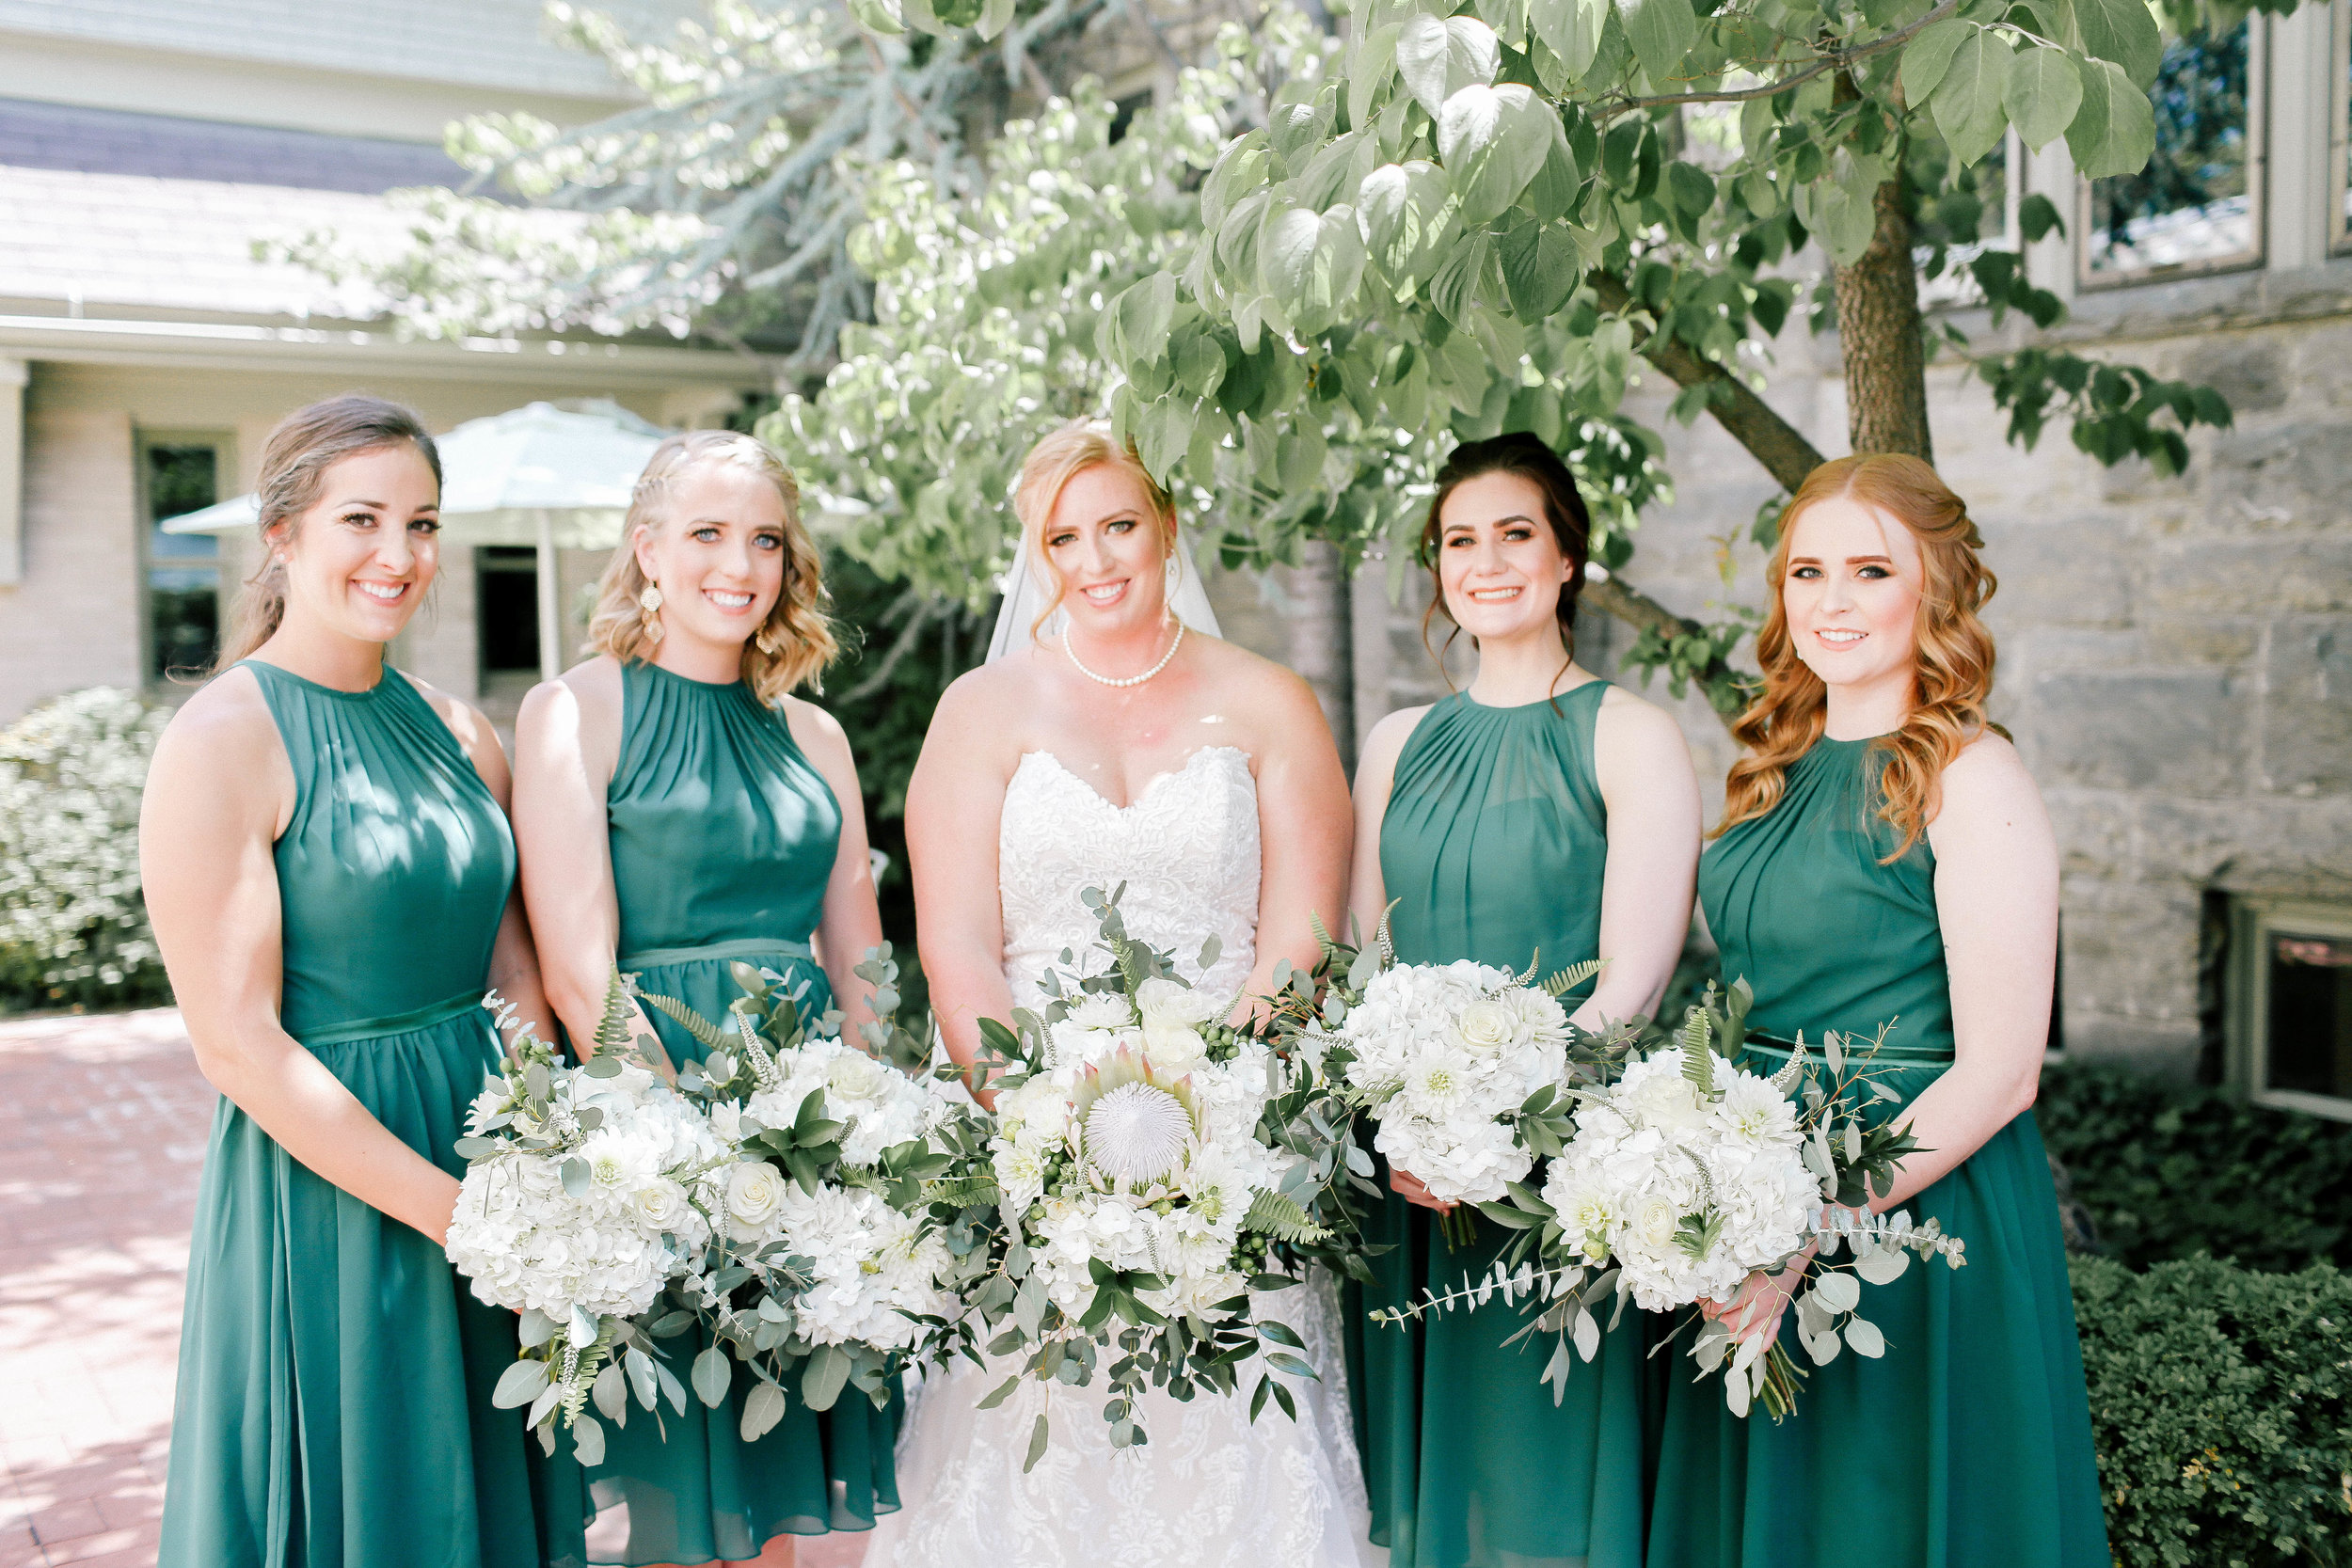 A-Lydia-Rohan-Downtown-Boise-Wedding-6.jpg